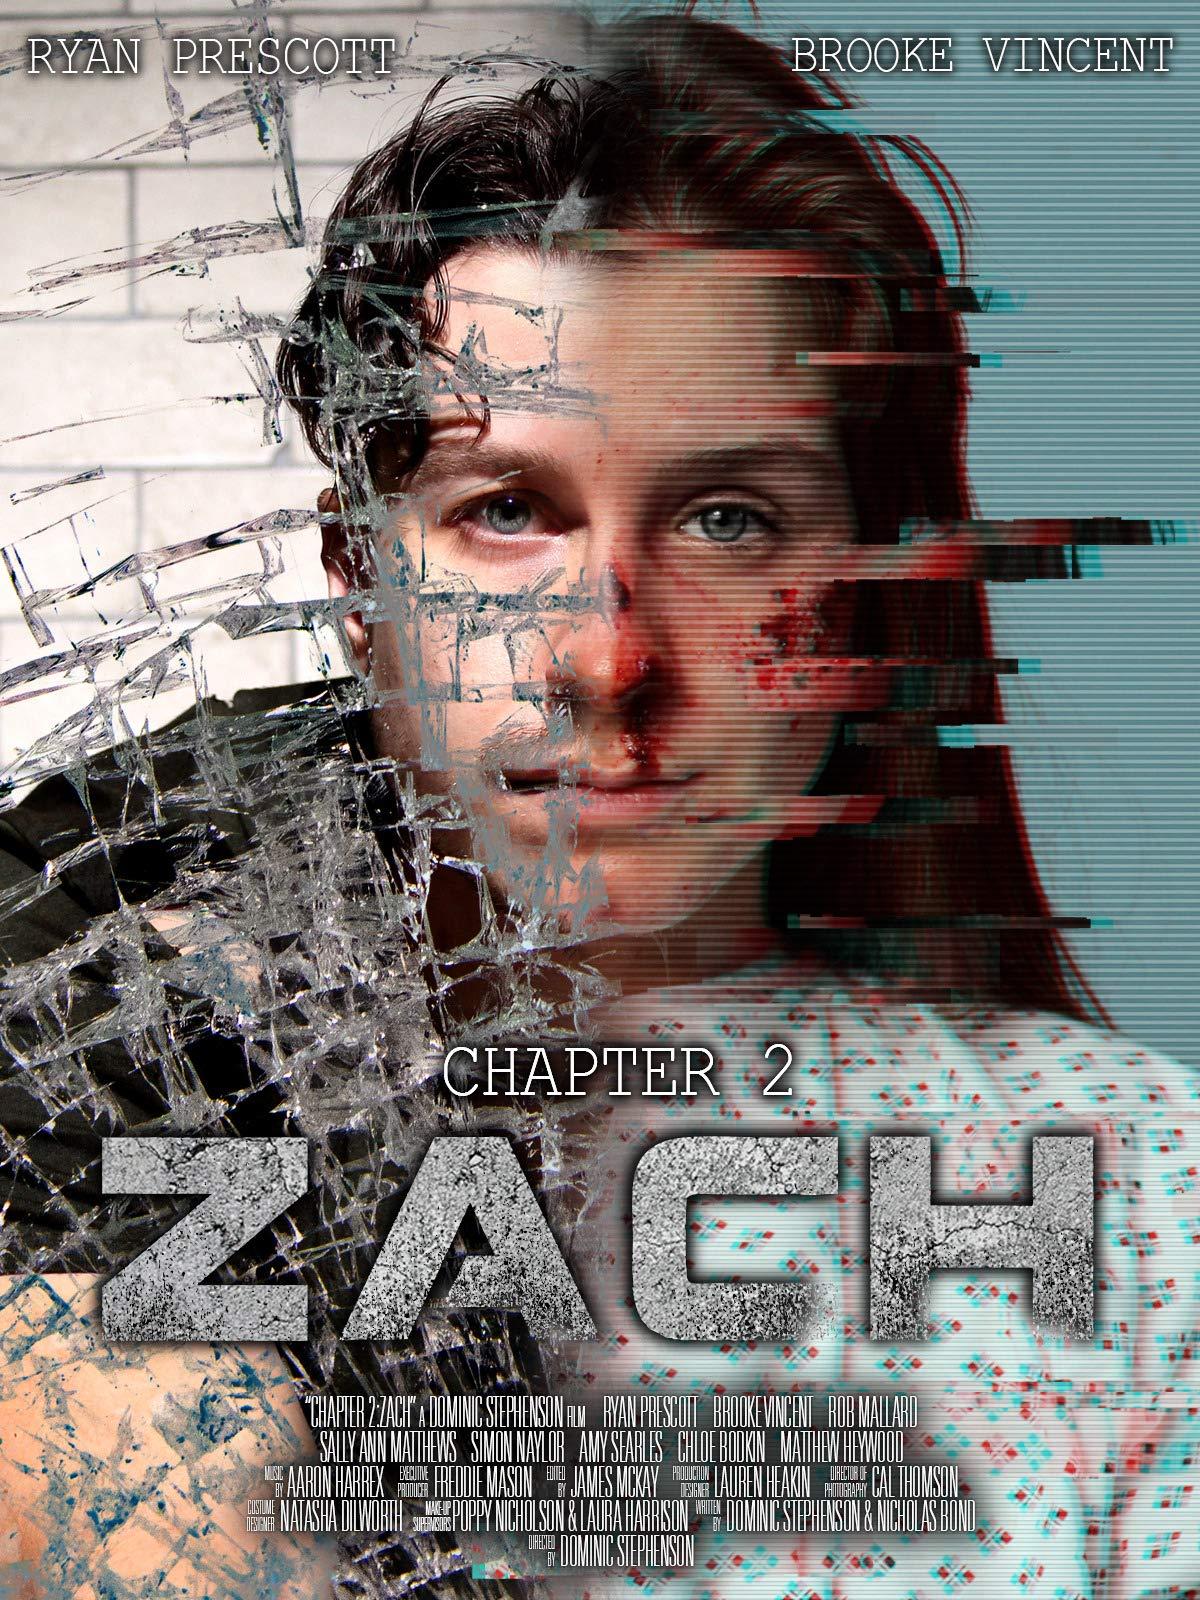 Chapter 2: ZACH